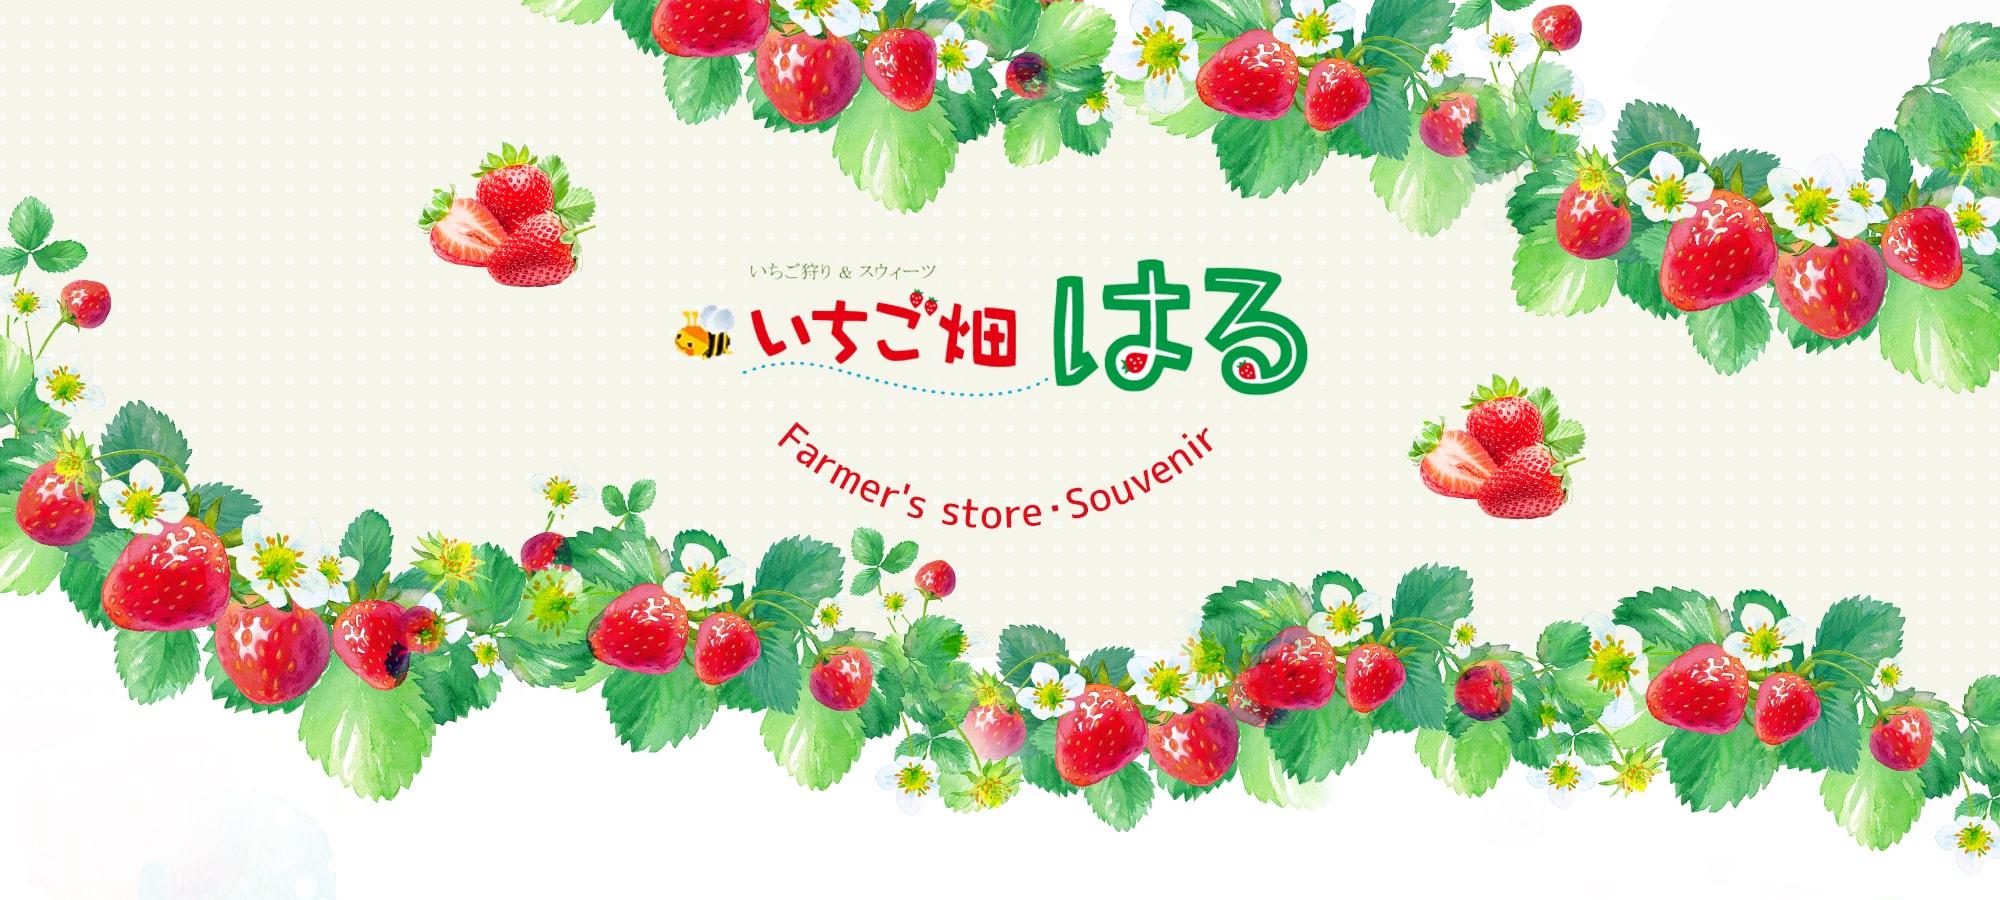 Farmer's store・Souvenir